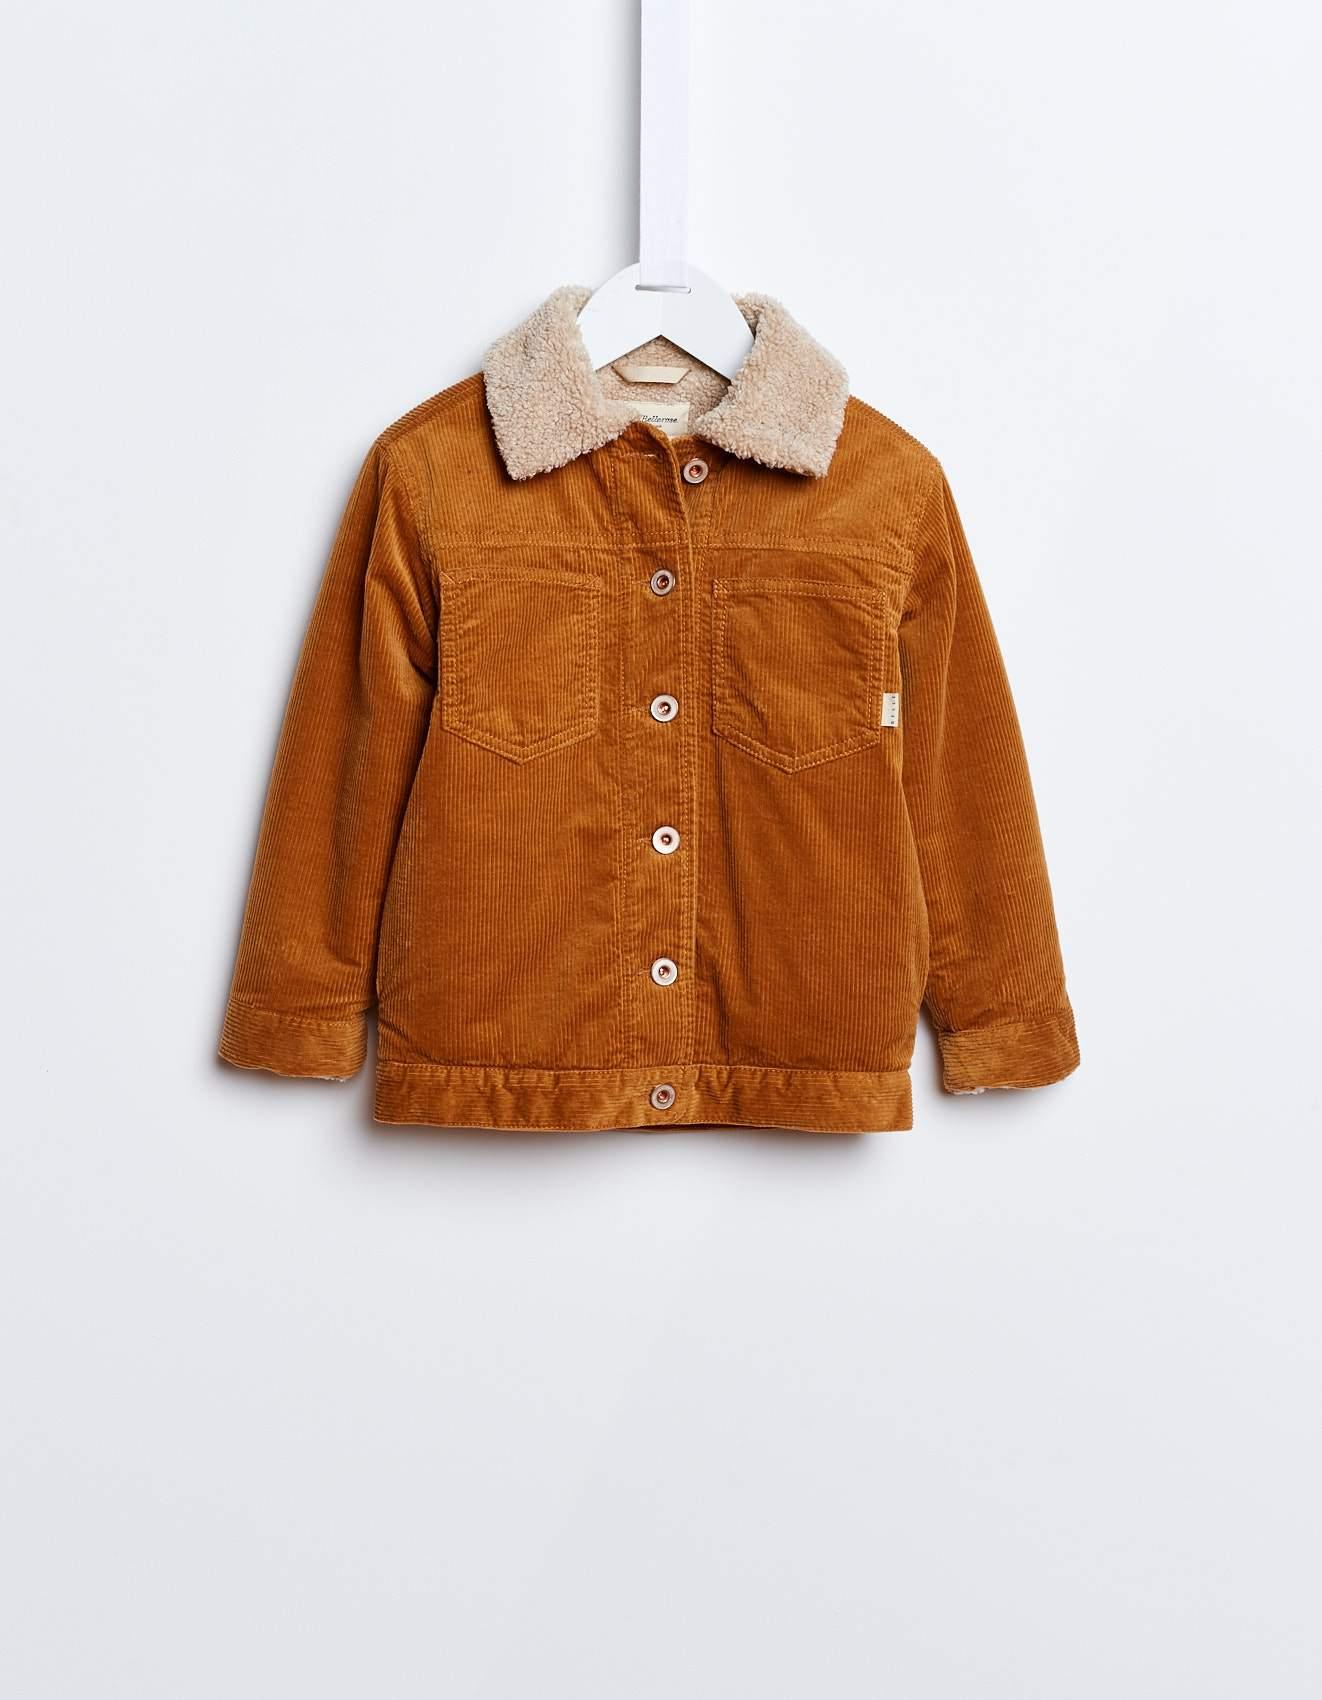 londen-jacket-bellerose.jpg